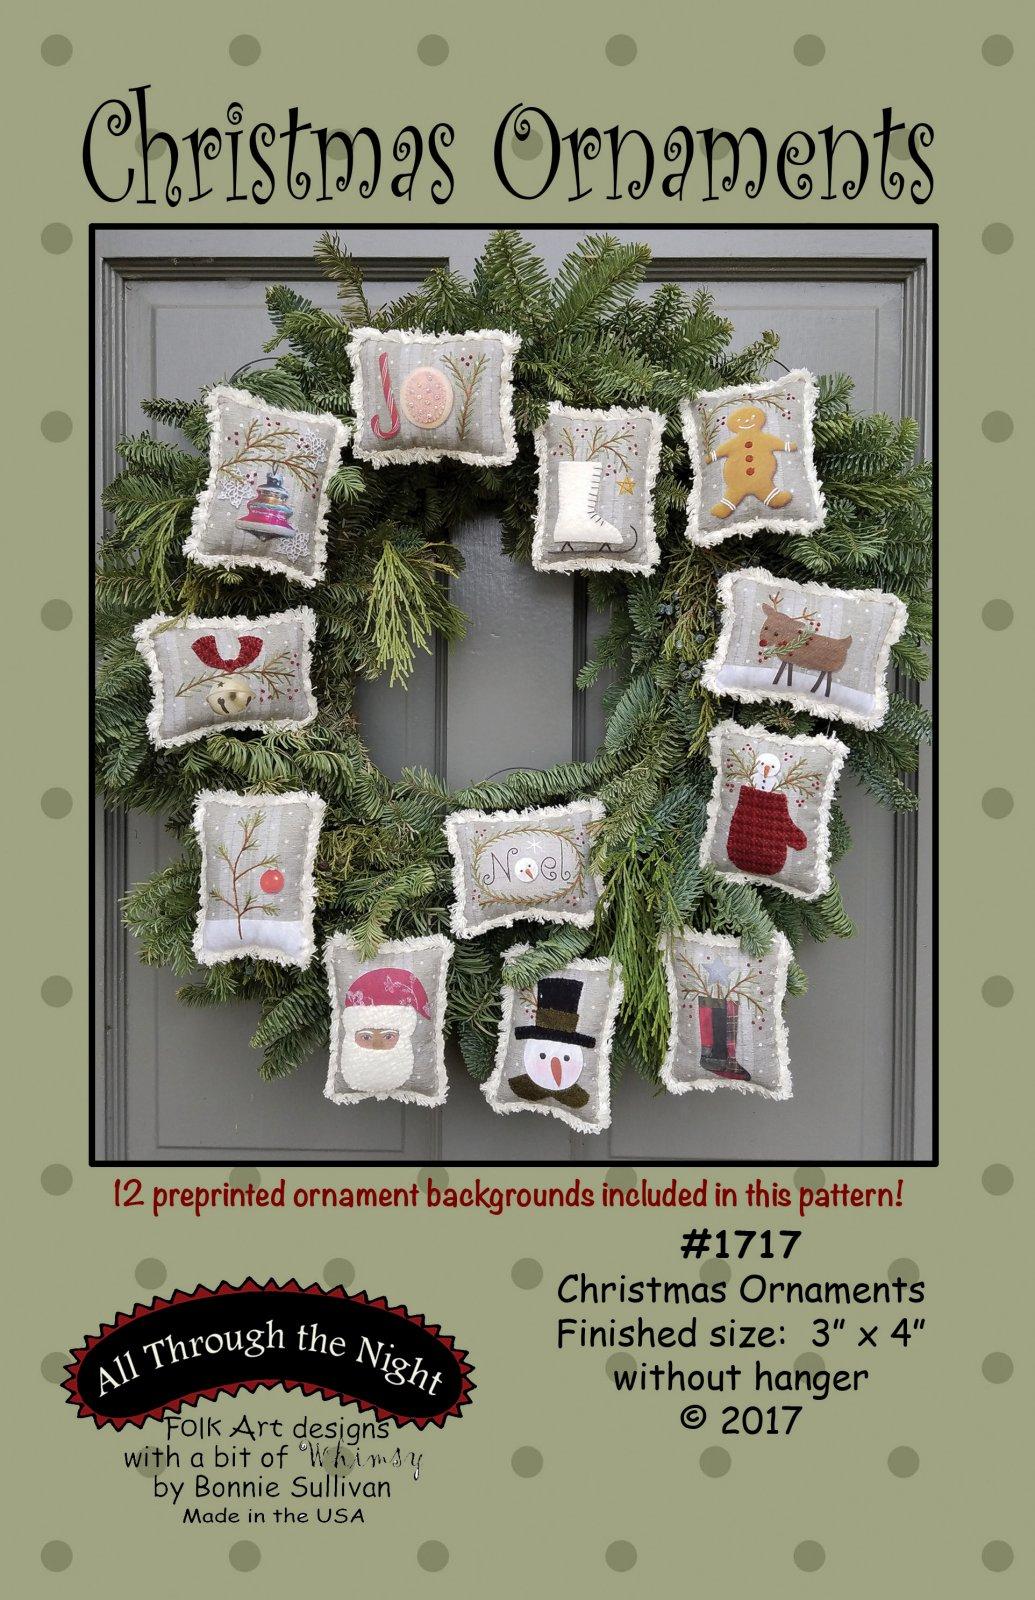 1717-christmas-ornaments-20170421153347.jpg